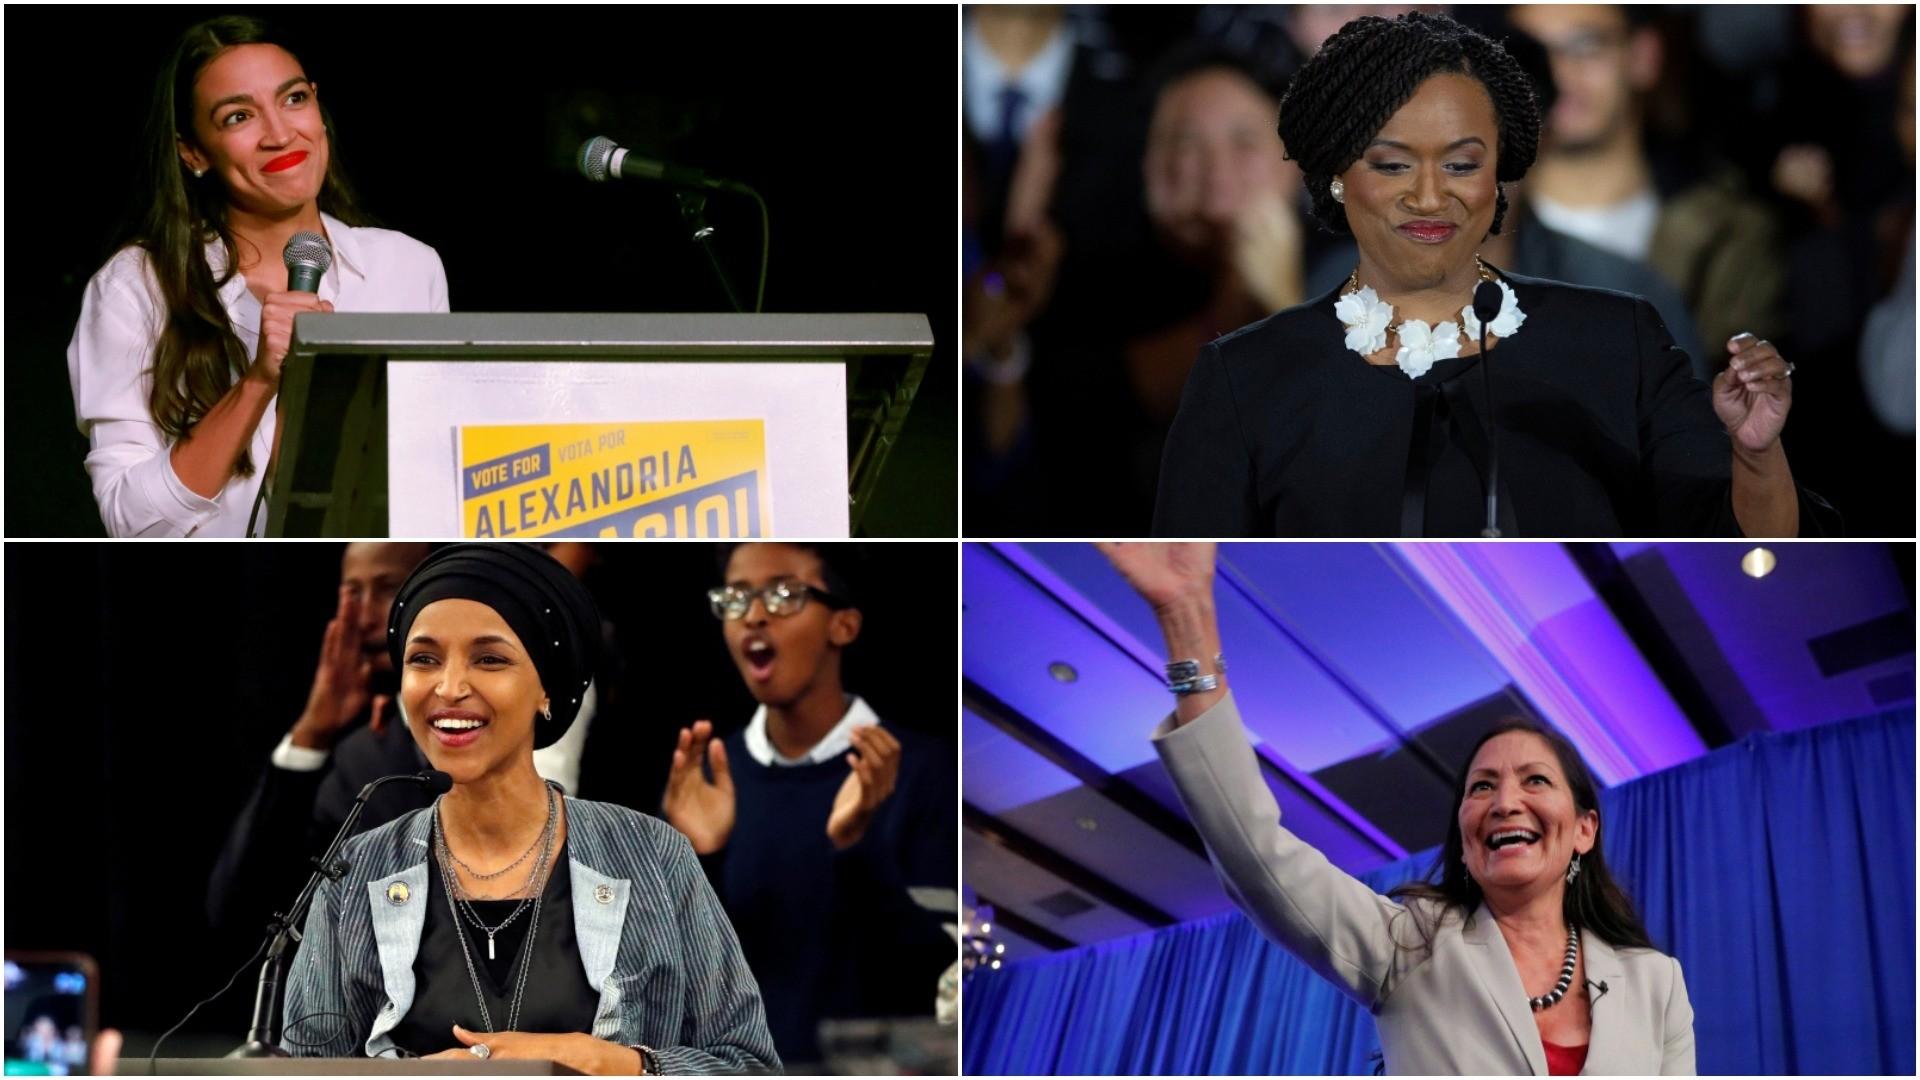 From top left, clockwise: Alexandria Ocasio-Cortez, Ayanna Pressley, Deb Haaland and Ilhan Omar. (REUTERS/EPA Photos)